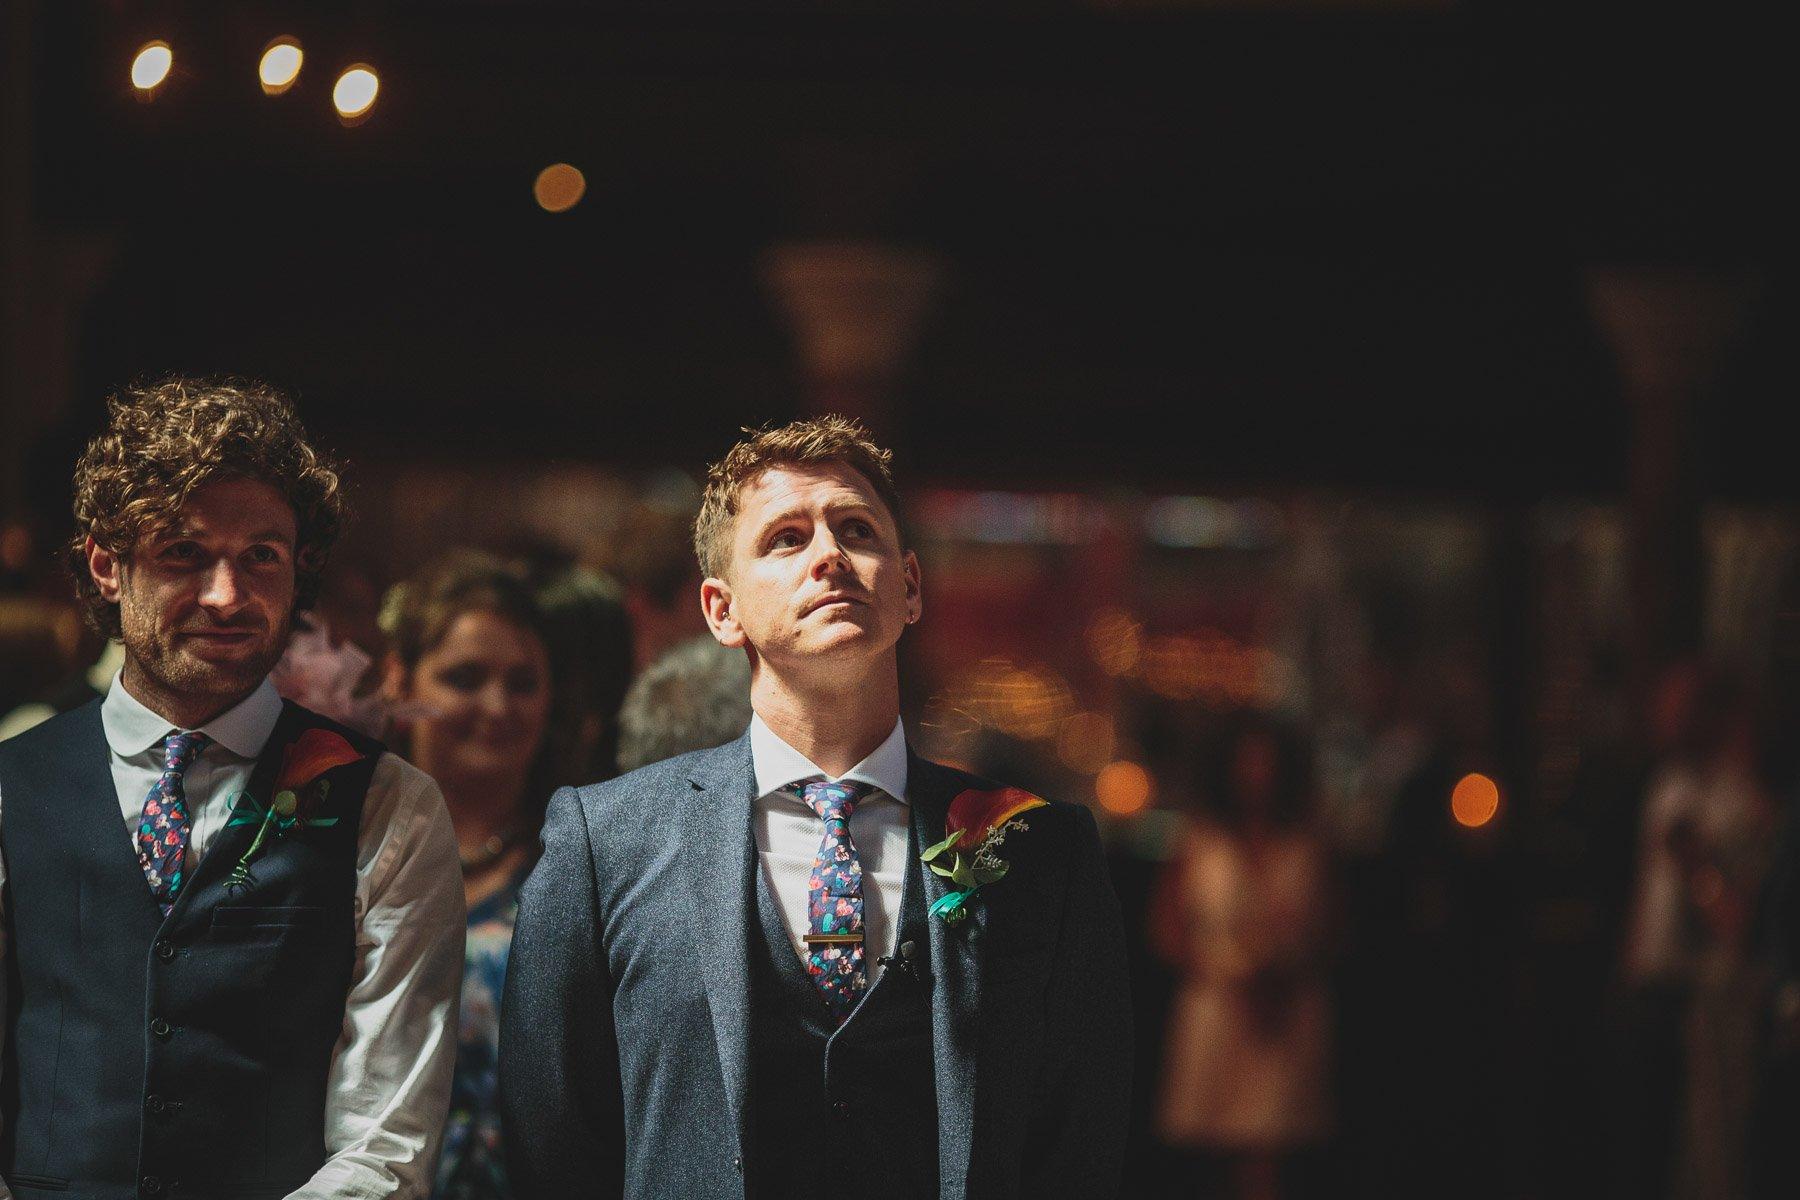 eastbourne-wedding-photography-hannah-tom-021